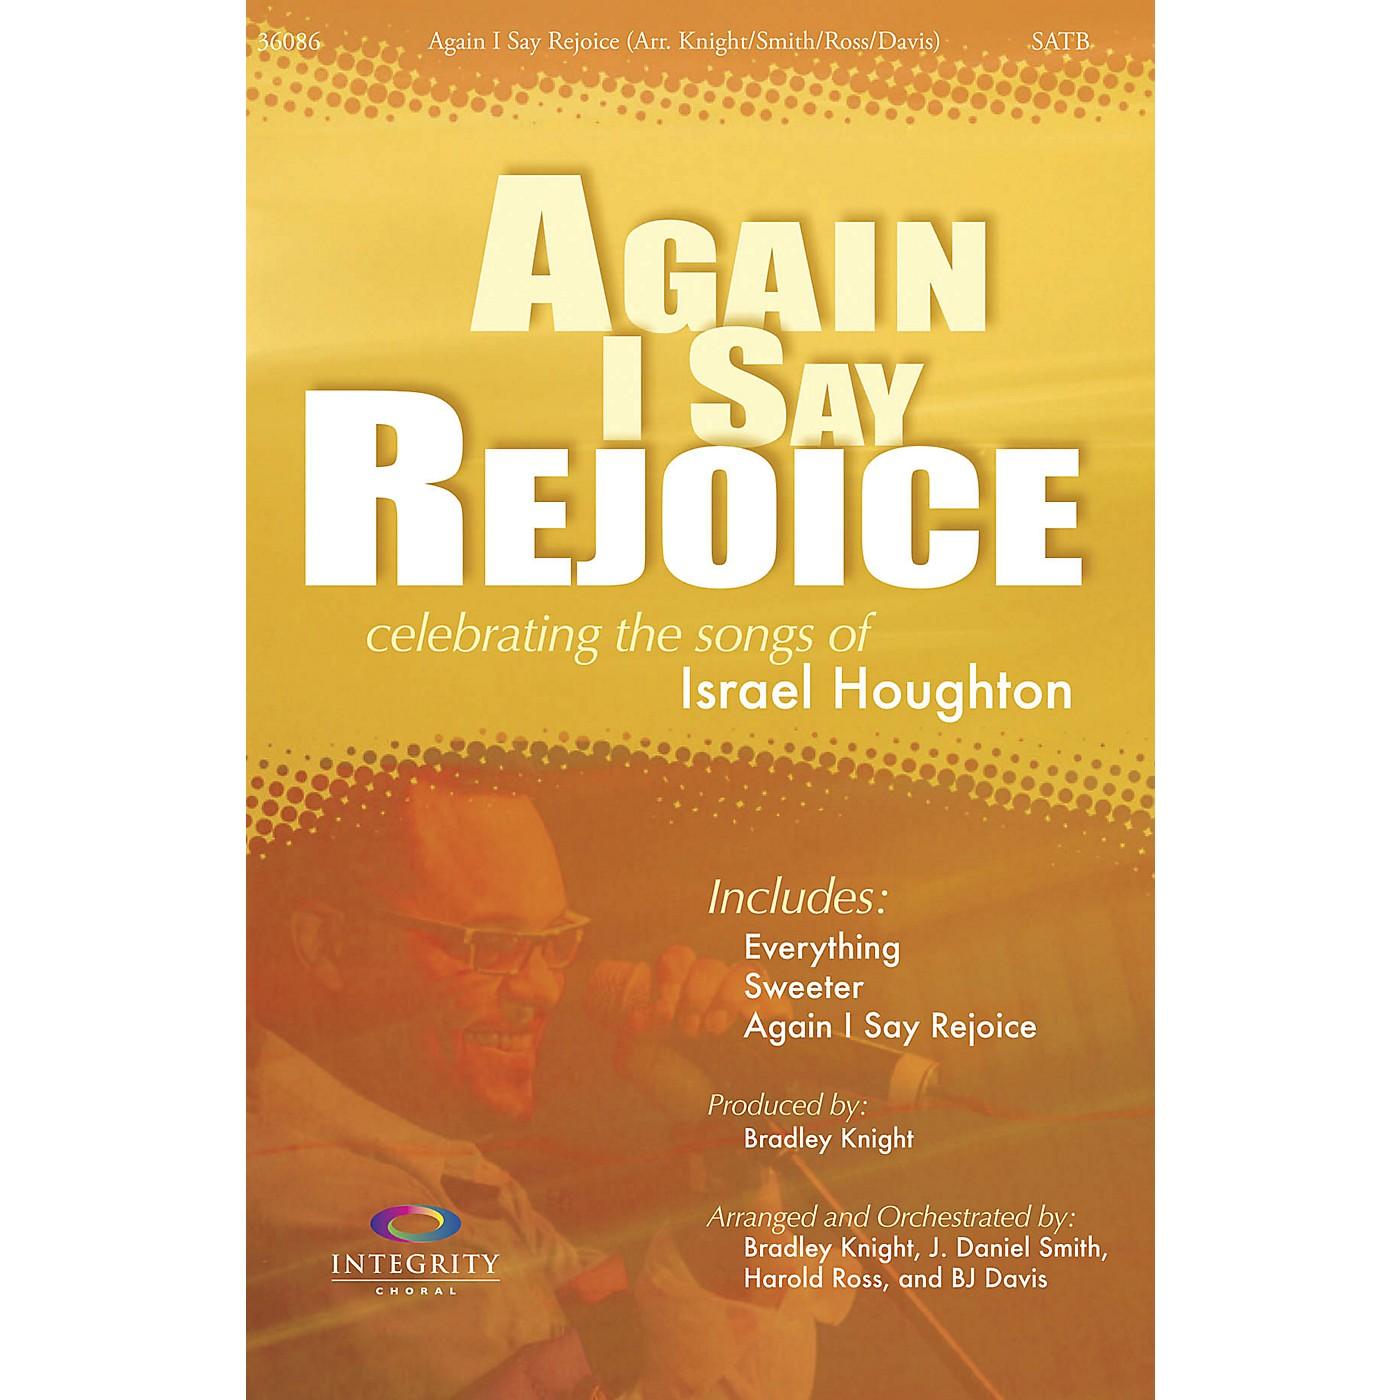 Integrity Music Again I Say Rejoice CD ACCOMP by Israel Houghton Arranged by BJ Davis/Bradley Knight/Harold Ross/Smith thumbnail